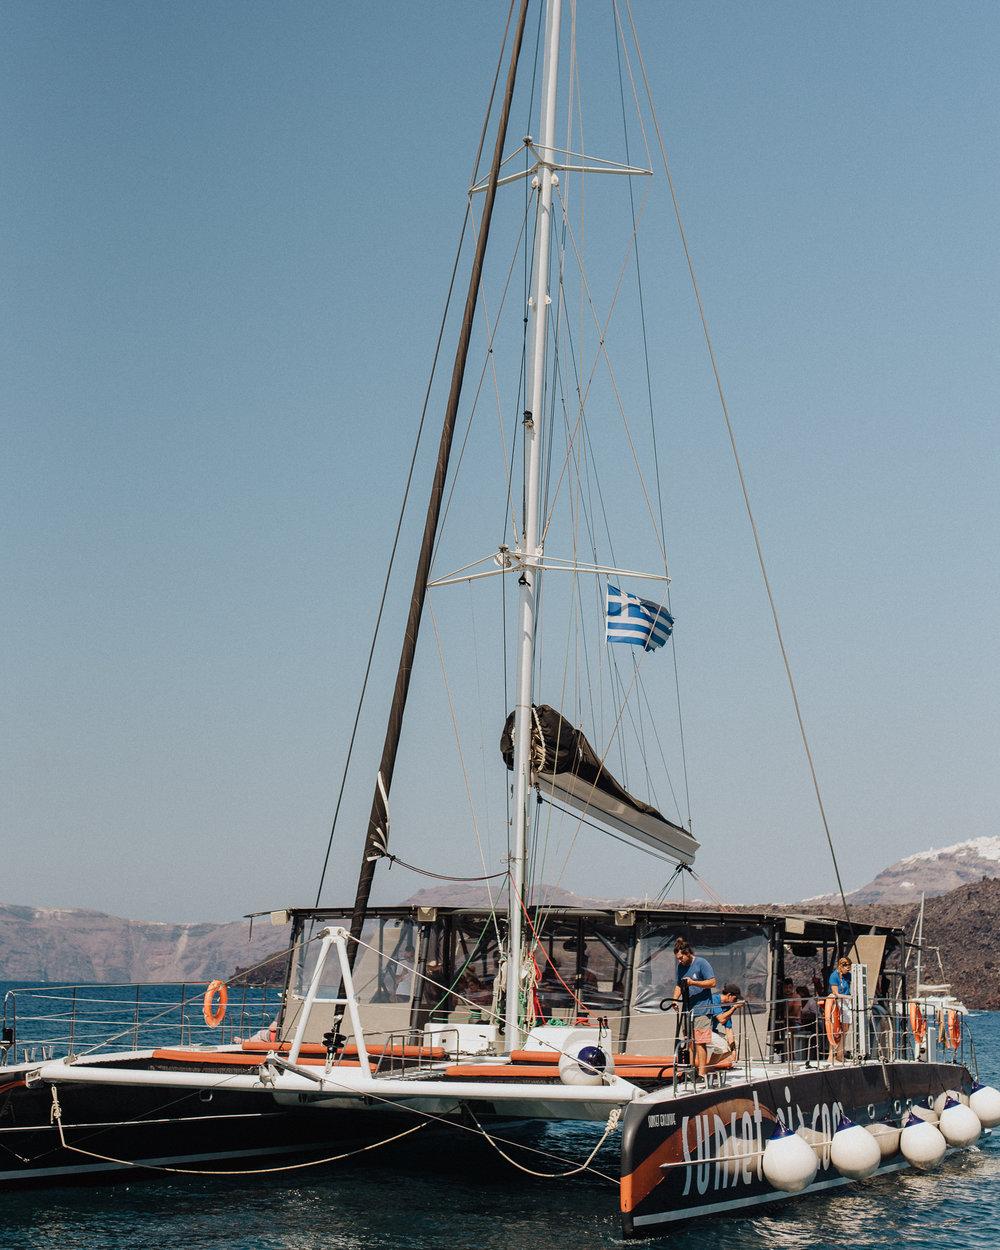 santorini-pre-wedding-destination-catamaran-cruise-party-bride-groom-rocabella-hotel-silkentile-event-planning-firm